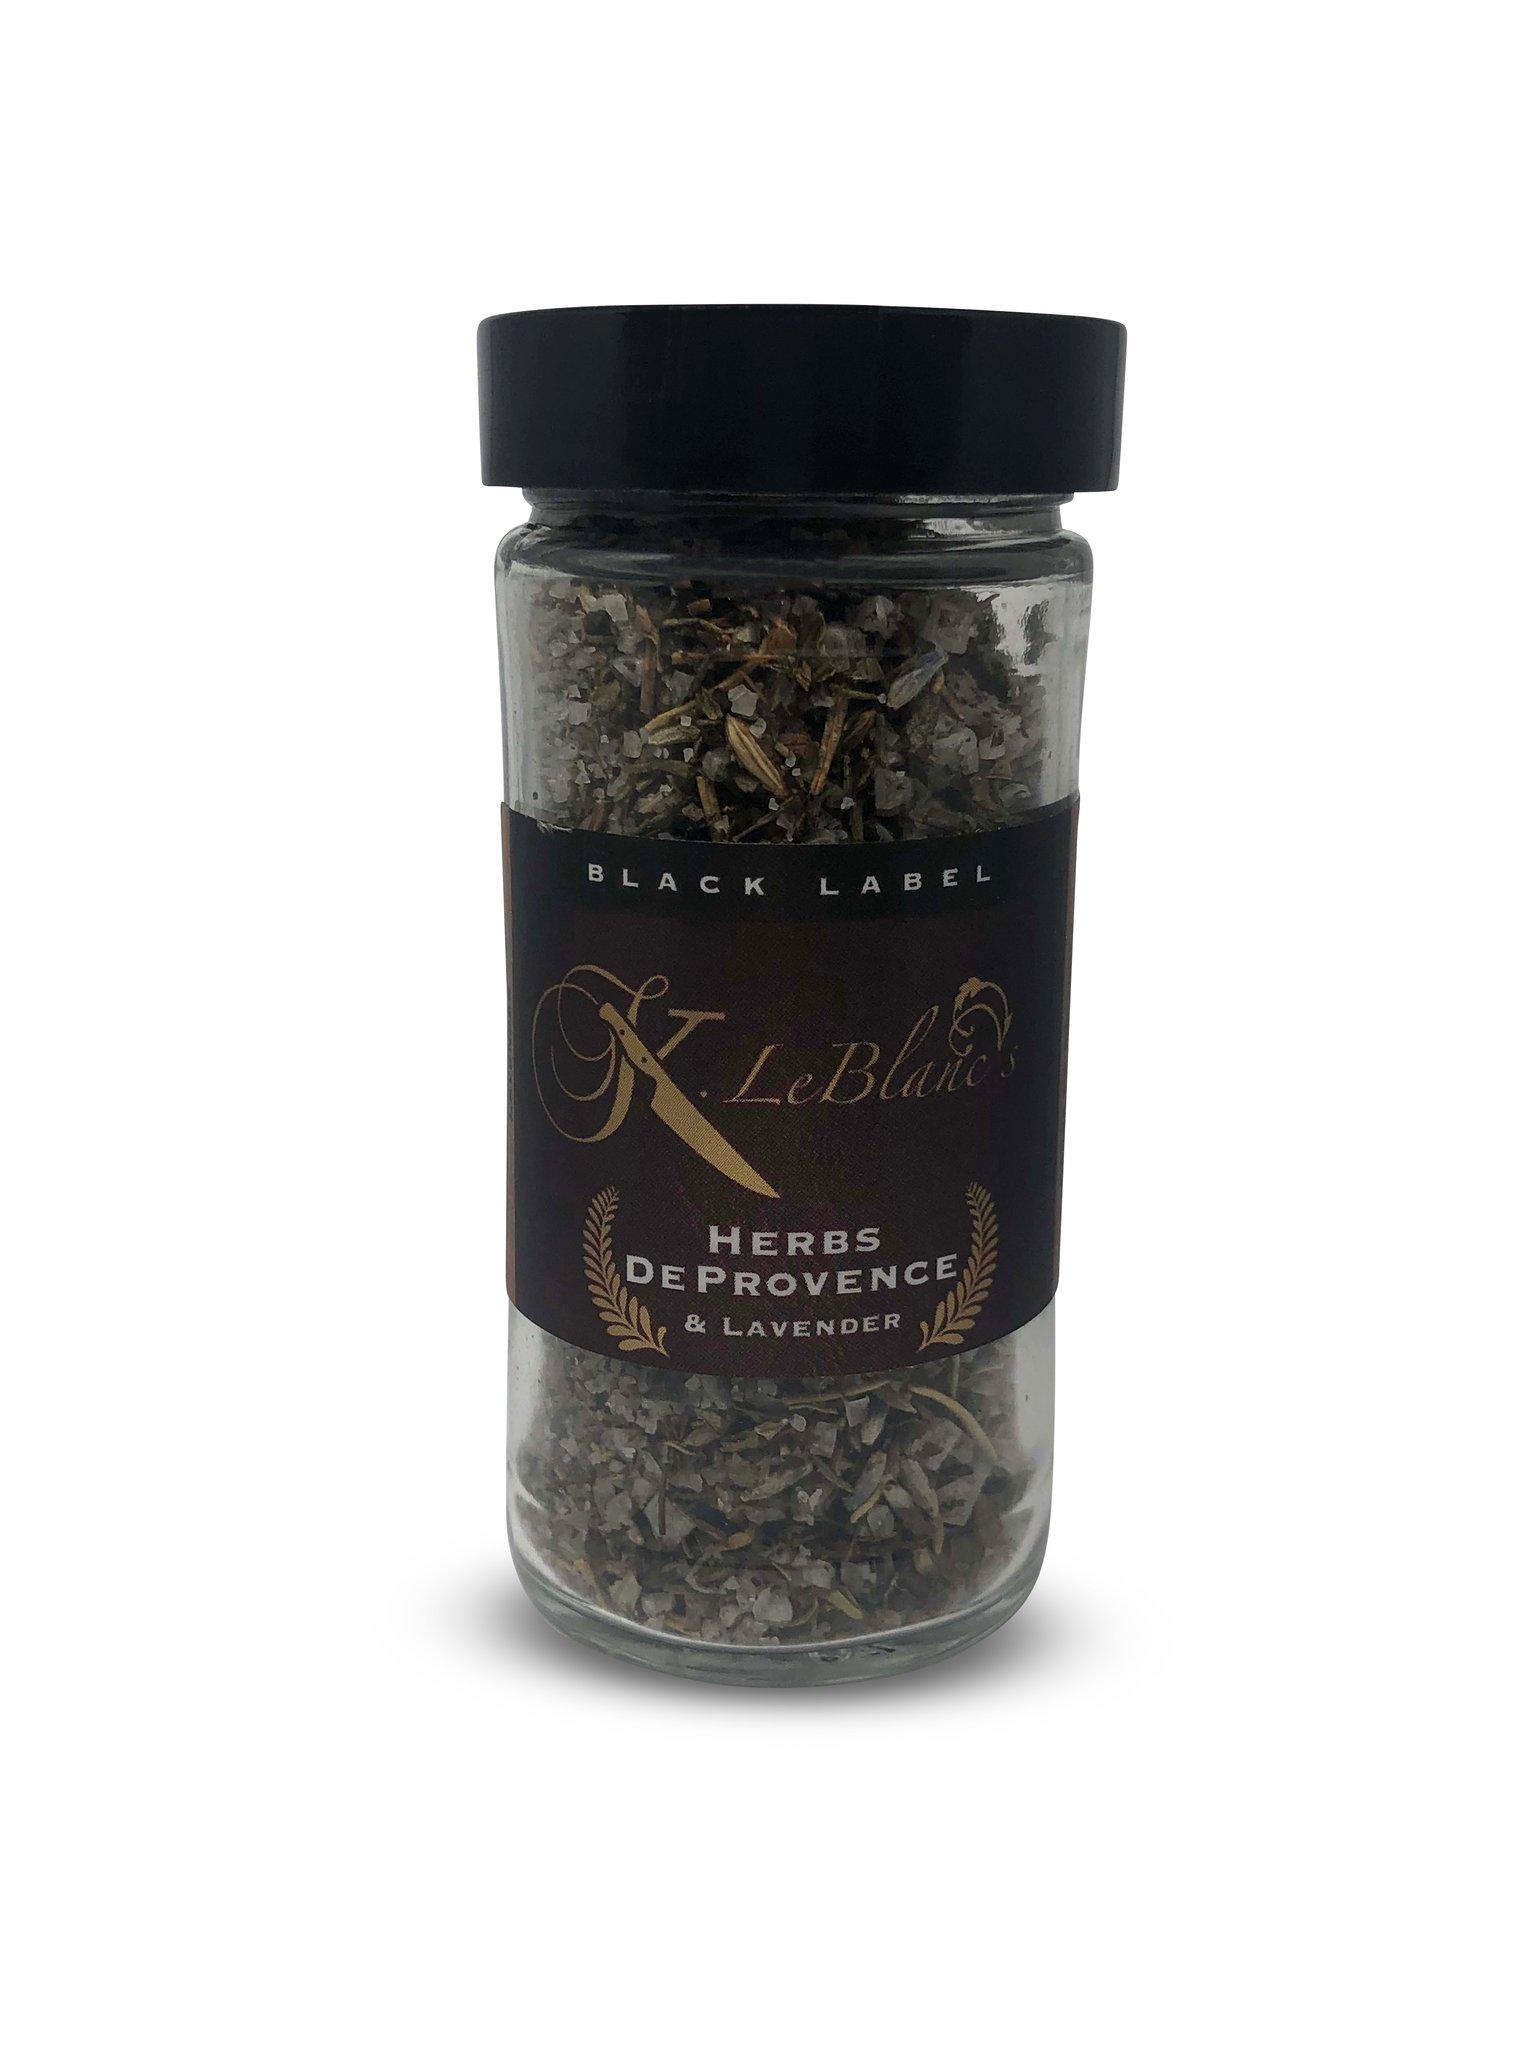 Image of Herbs De Provence & Lavender